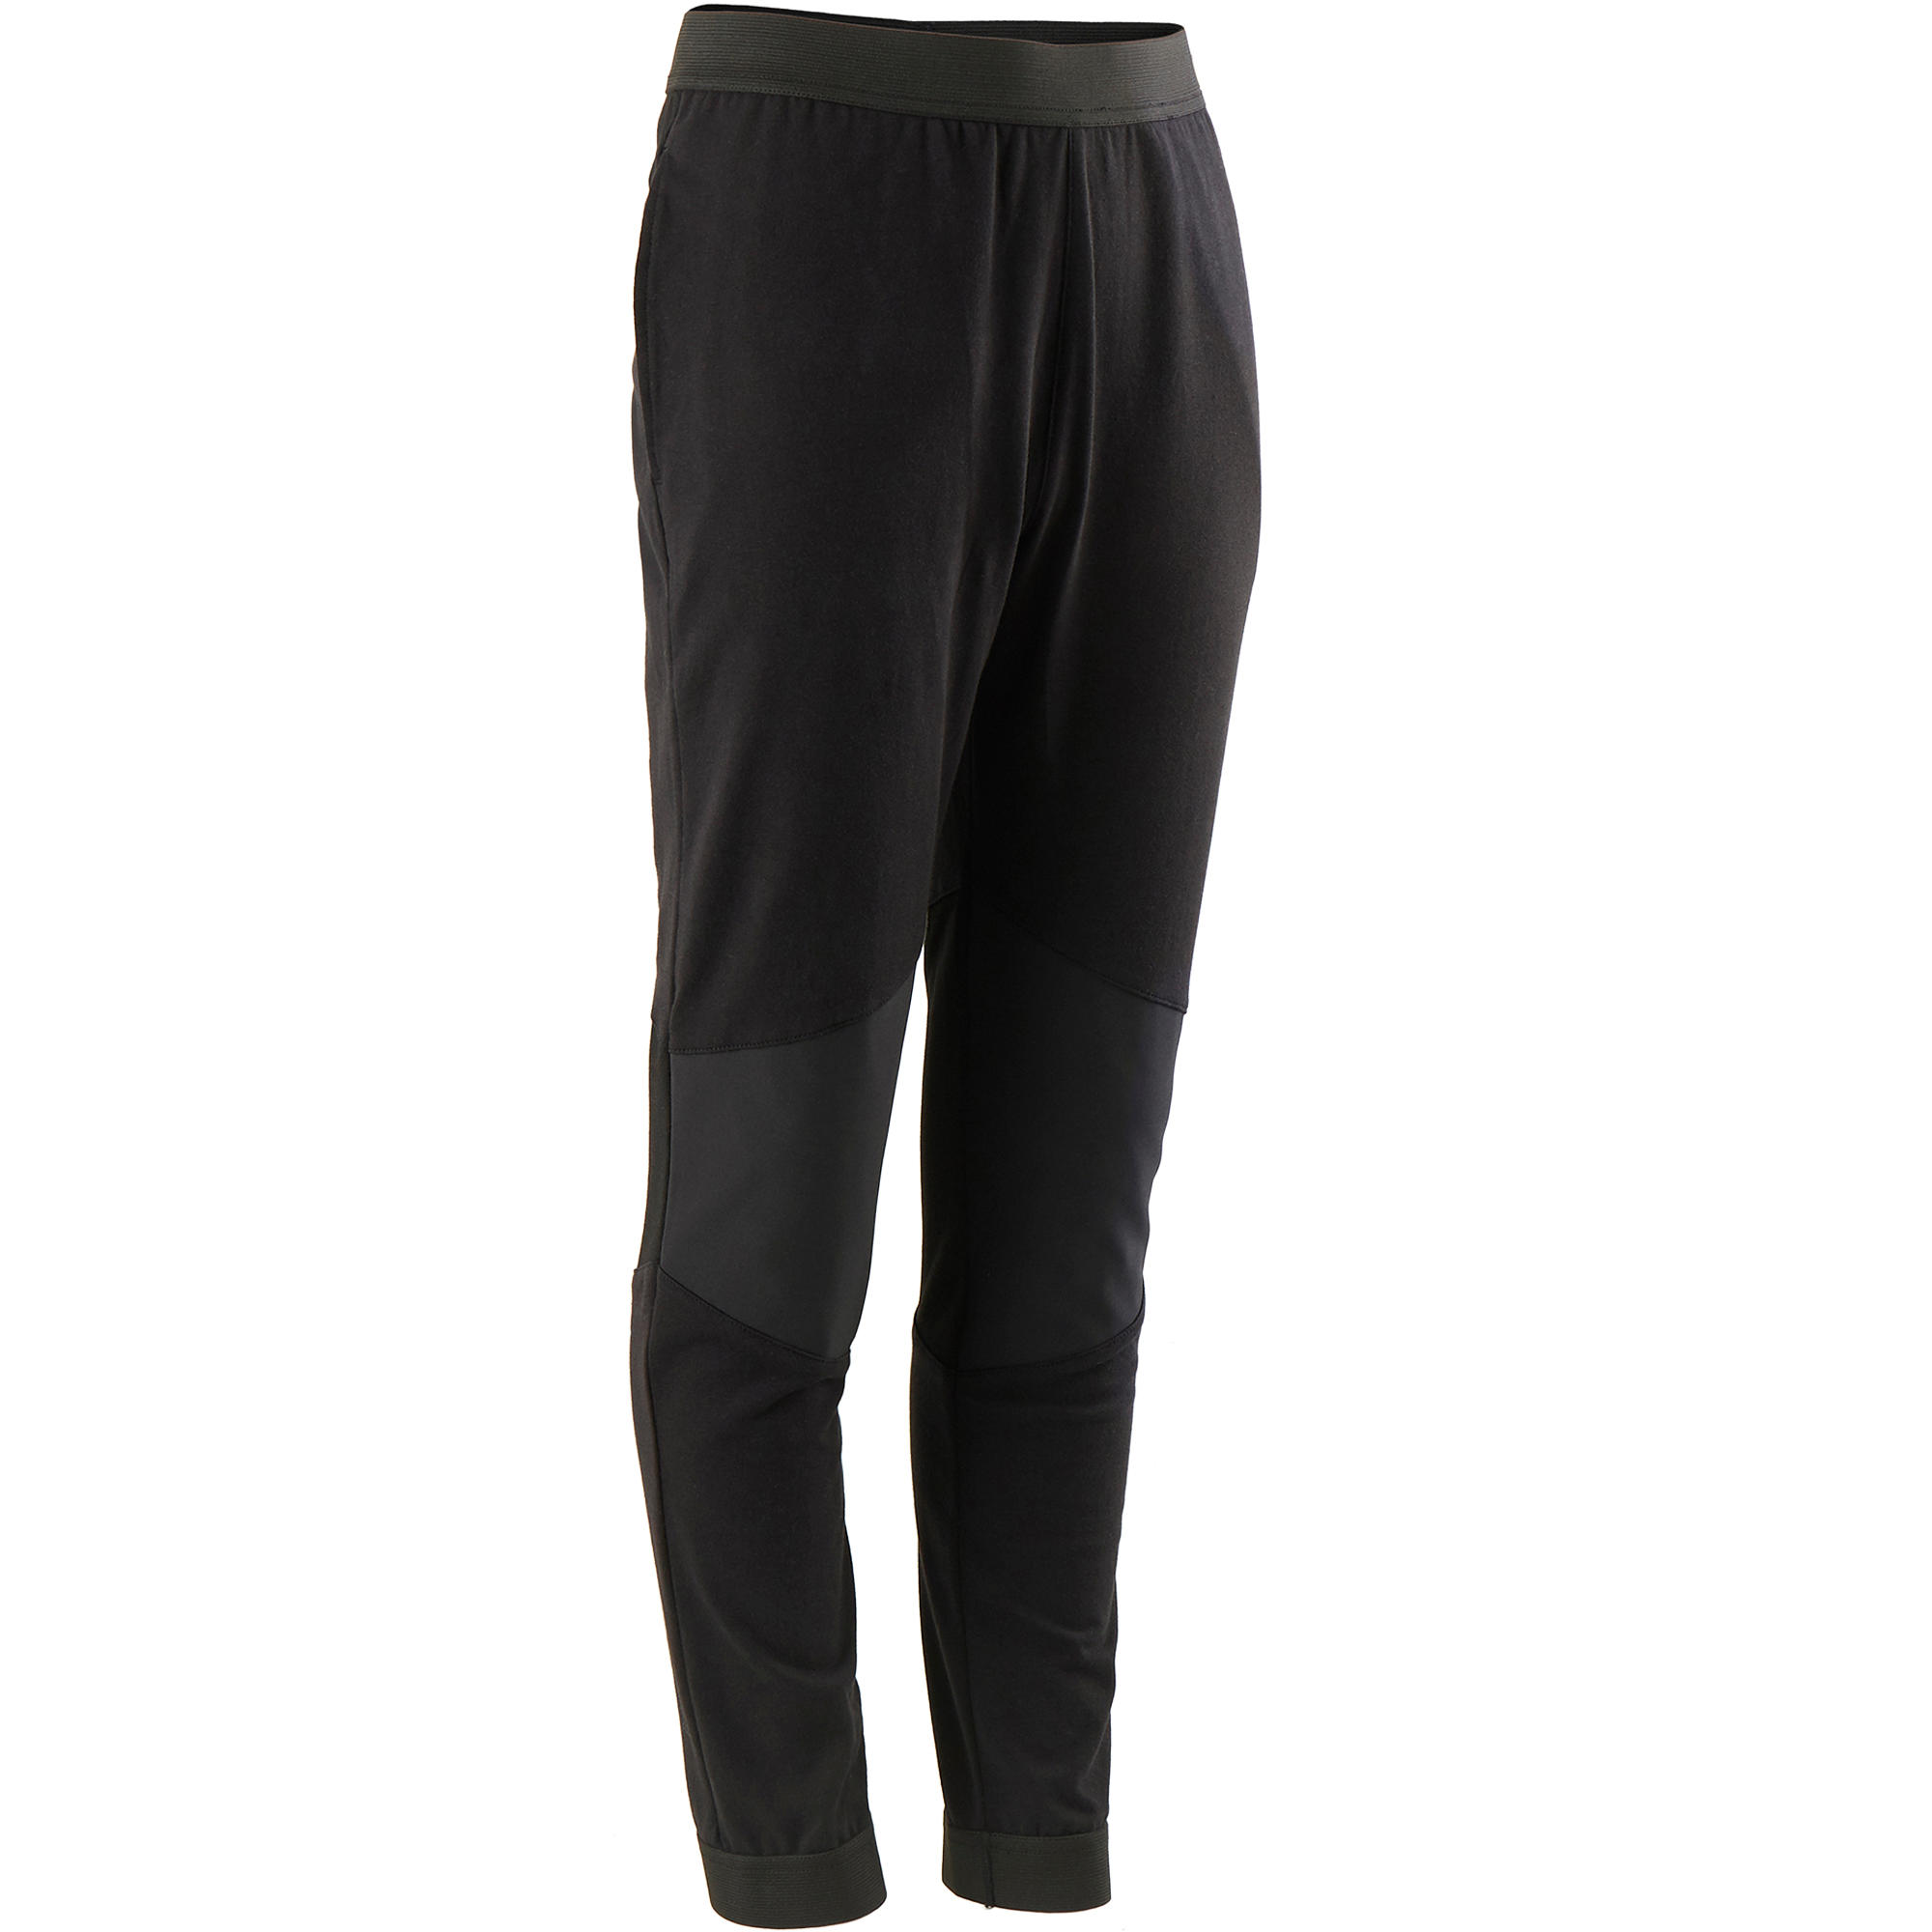 Pantalon 500 gri băieți